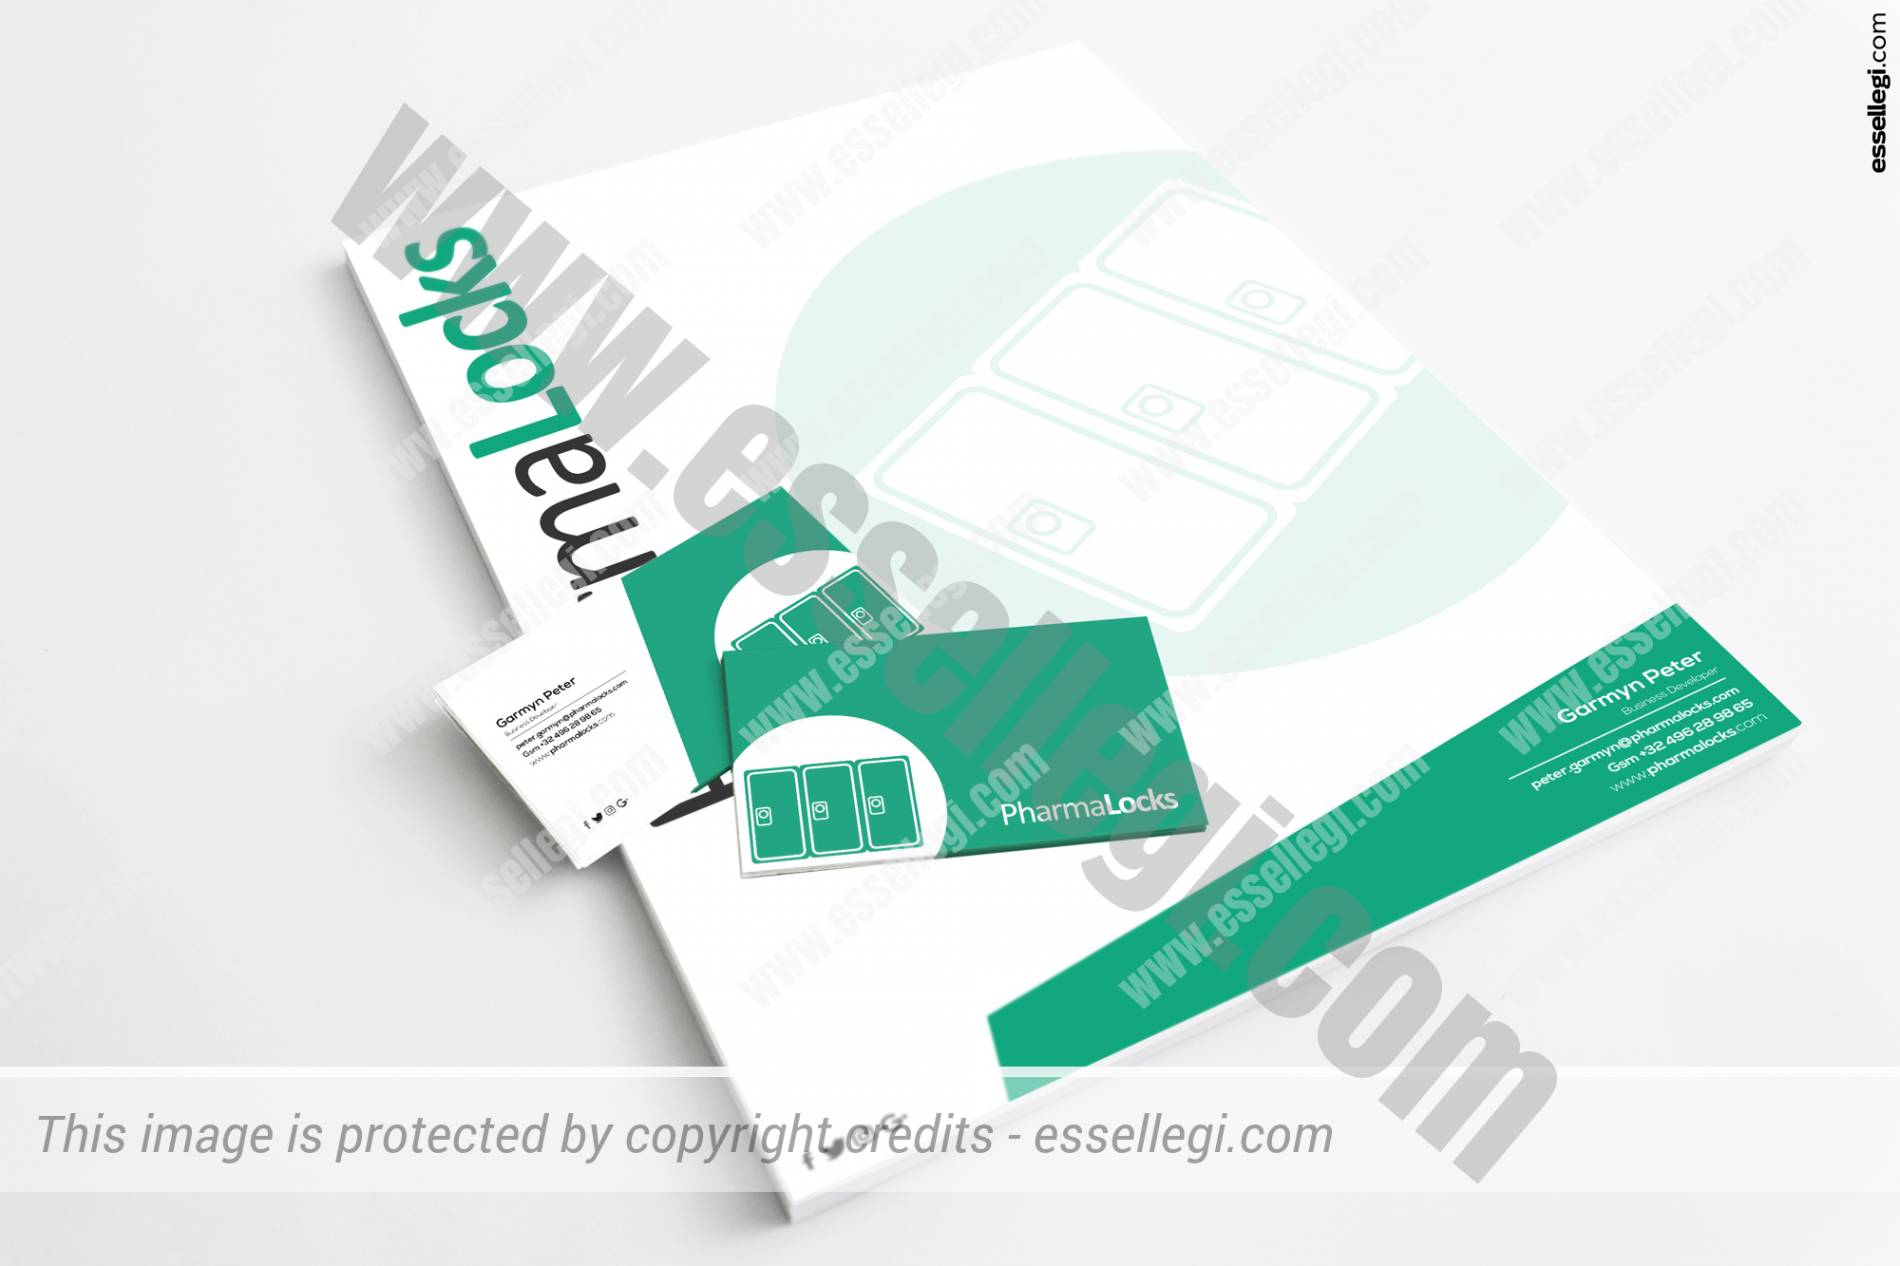 PharmaLocks Brand Identity Design by Essellegi Design